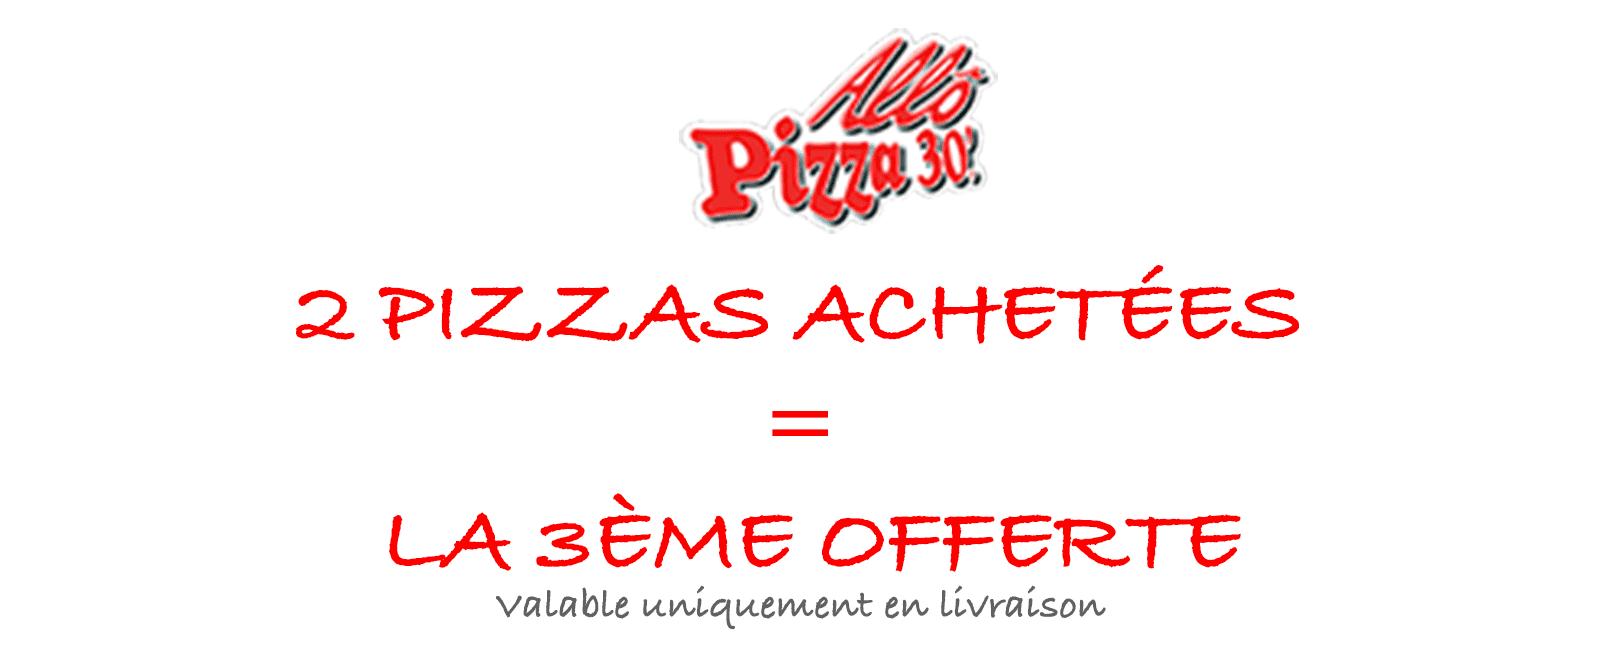 promo allo pizza 30 2 acheté la 3ieme offerte